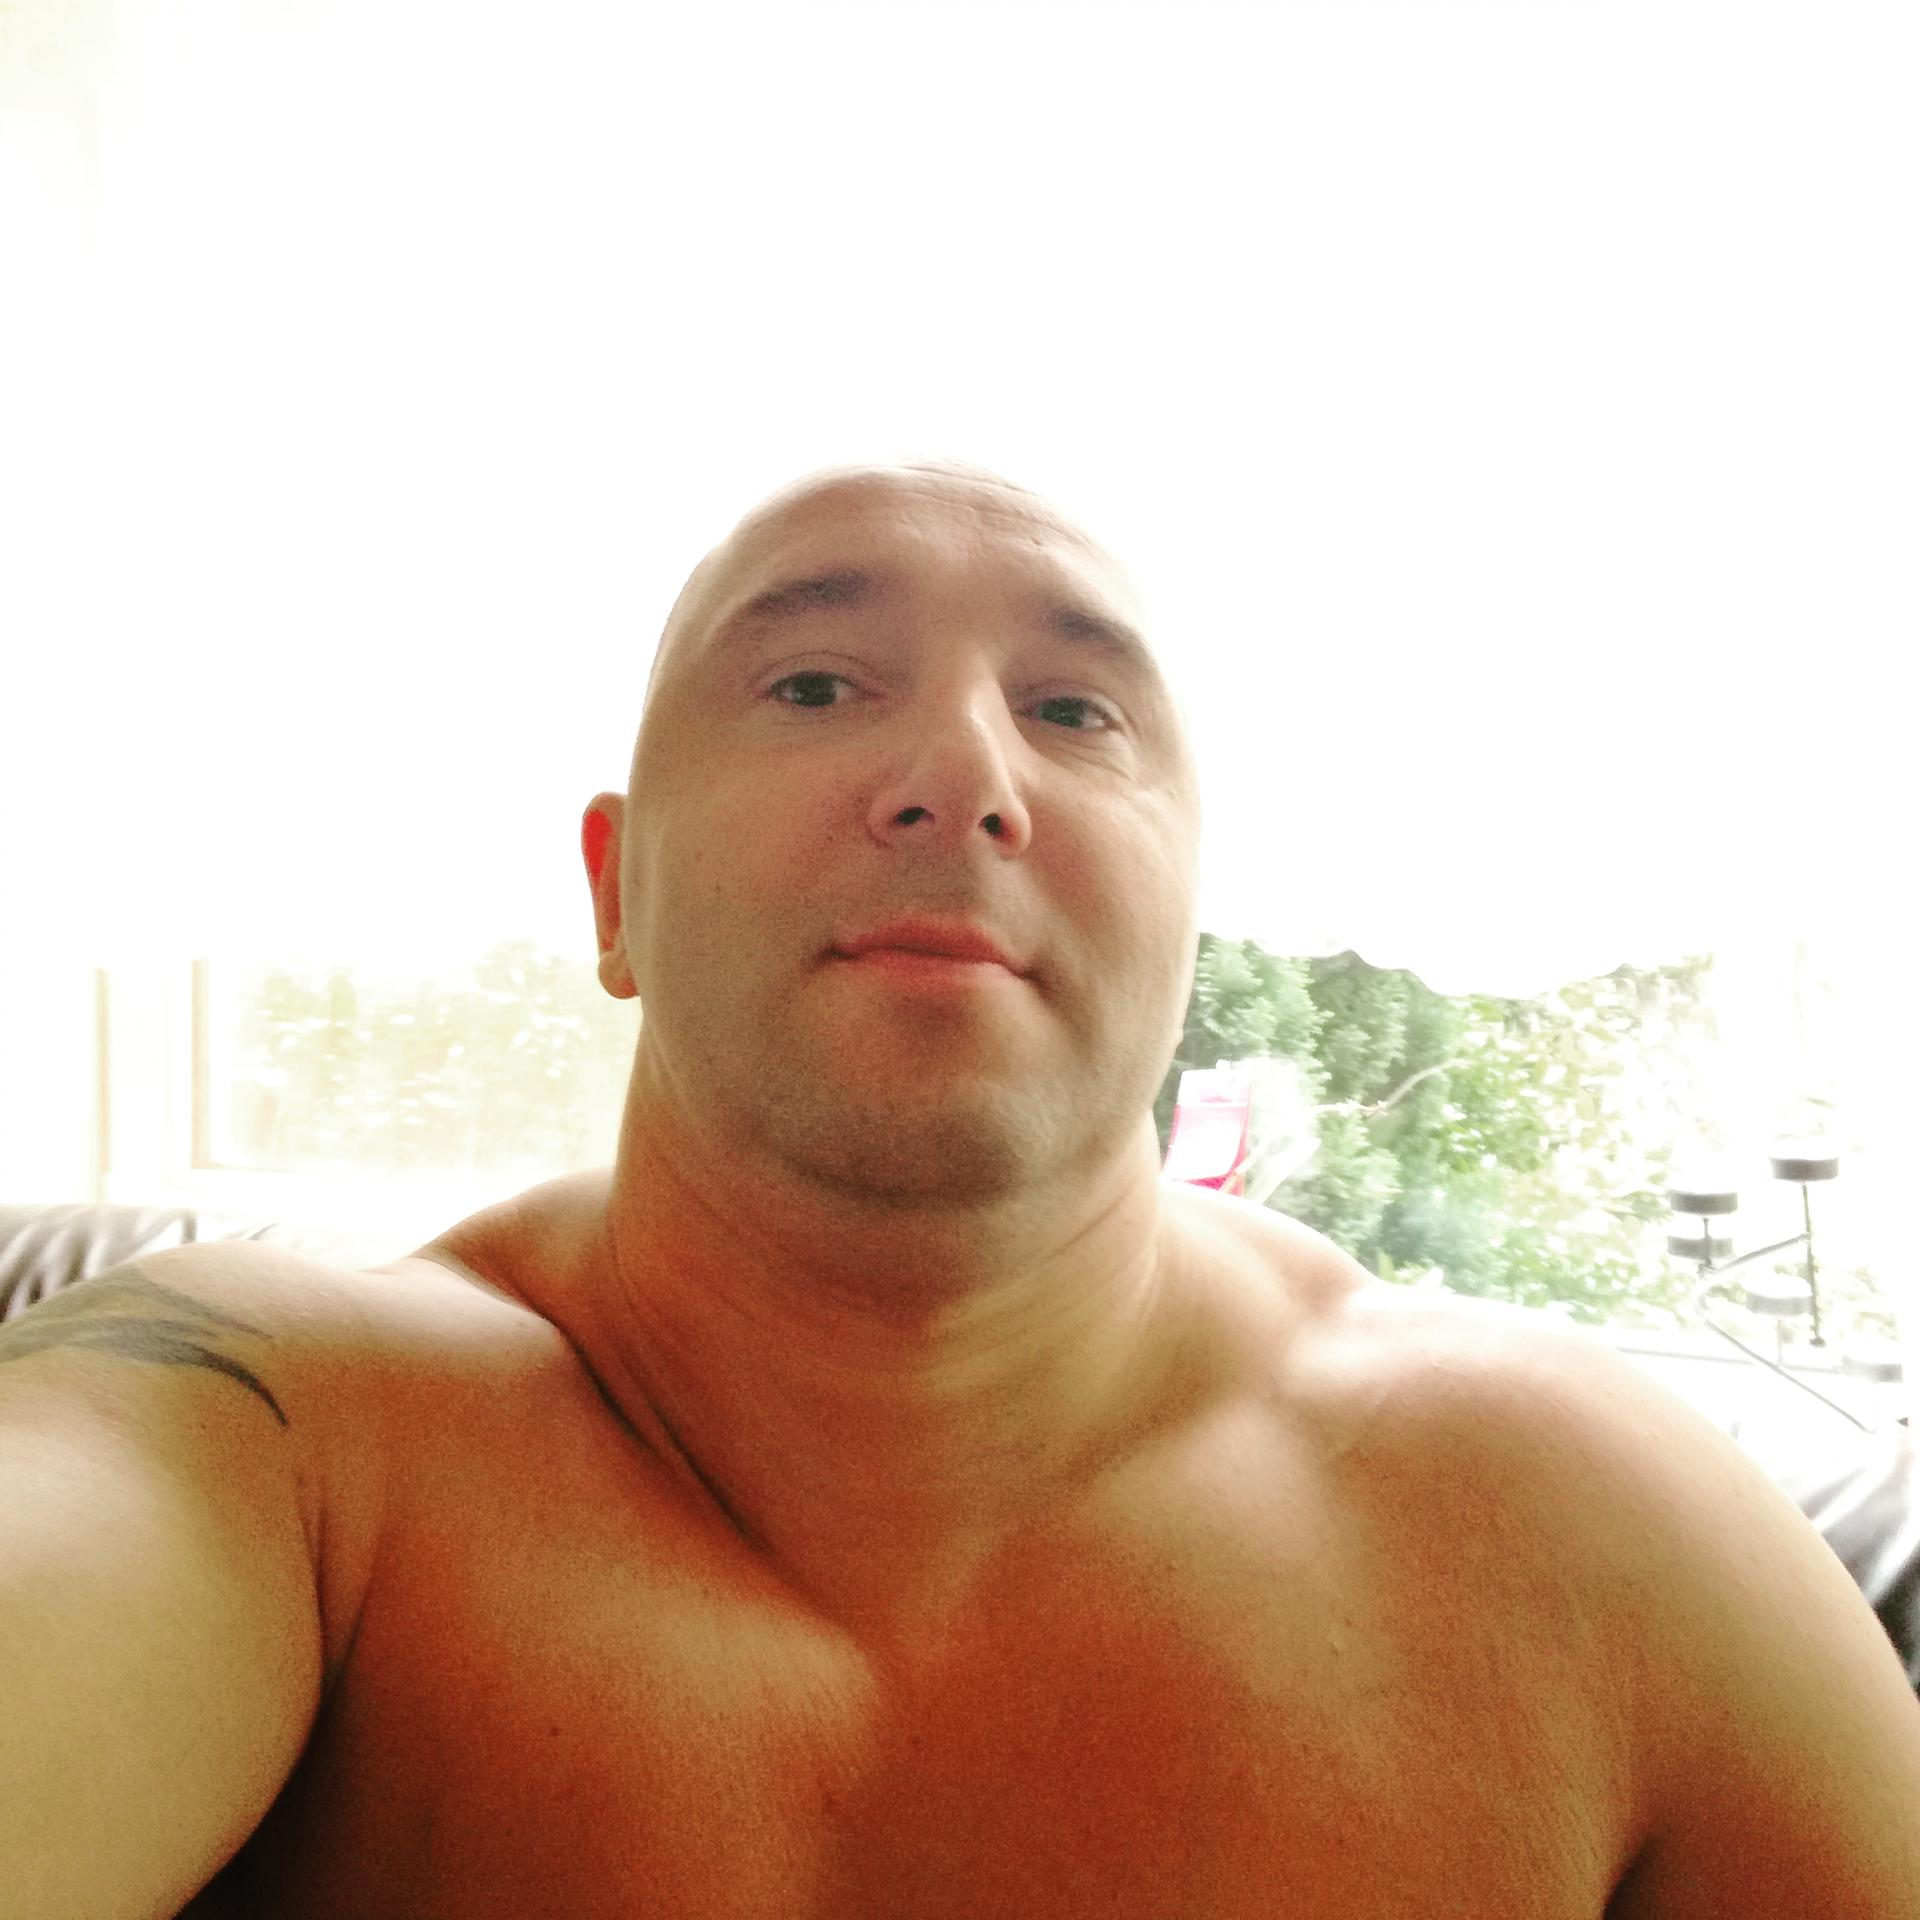 Andreo uit Zuid-Holland,Nederland